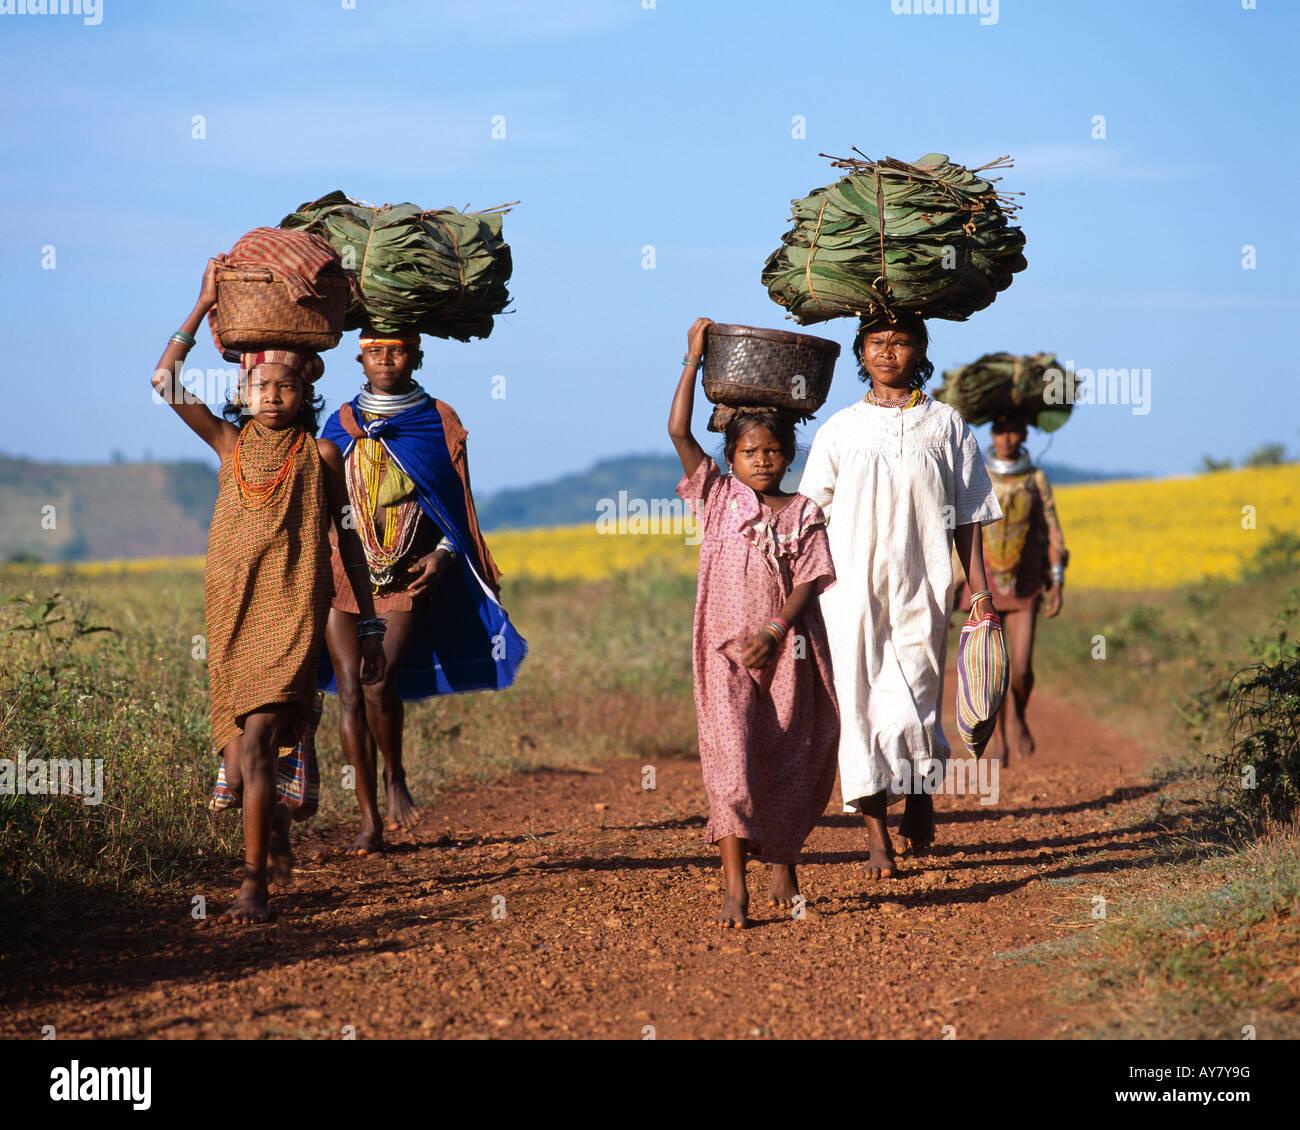 Bonda femmes tribales qui sera sur le marché, de l'Orissa, Inde Photo Stock